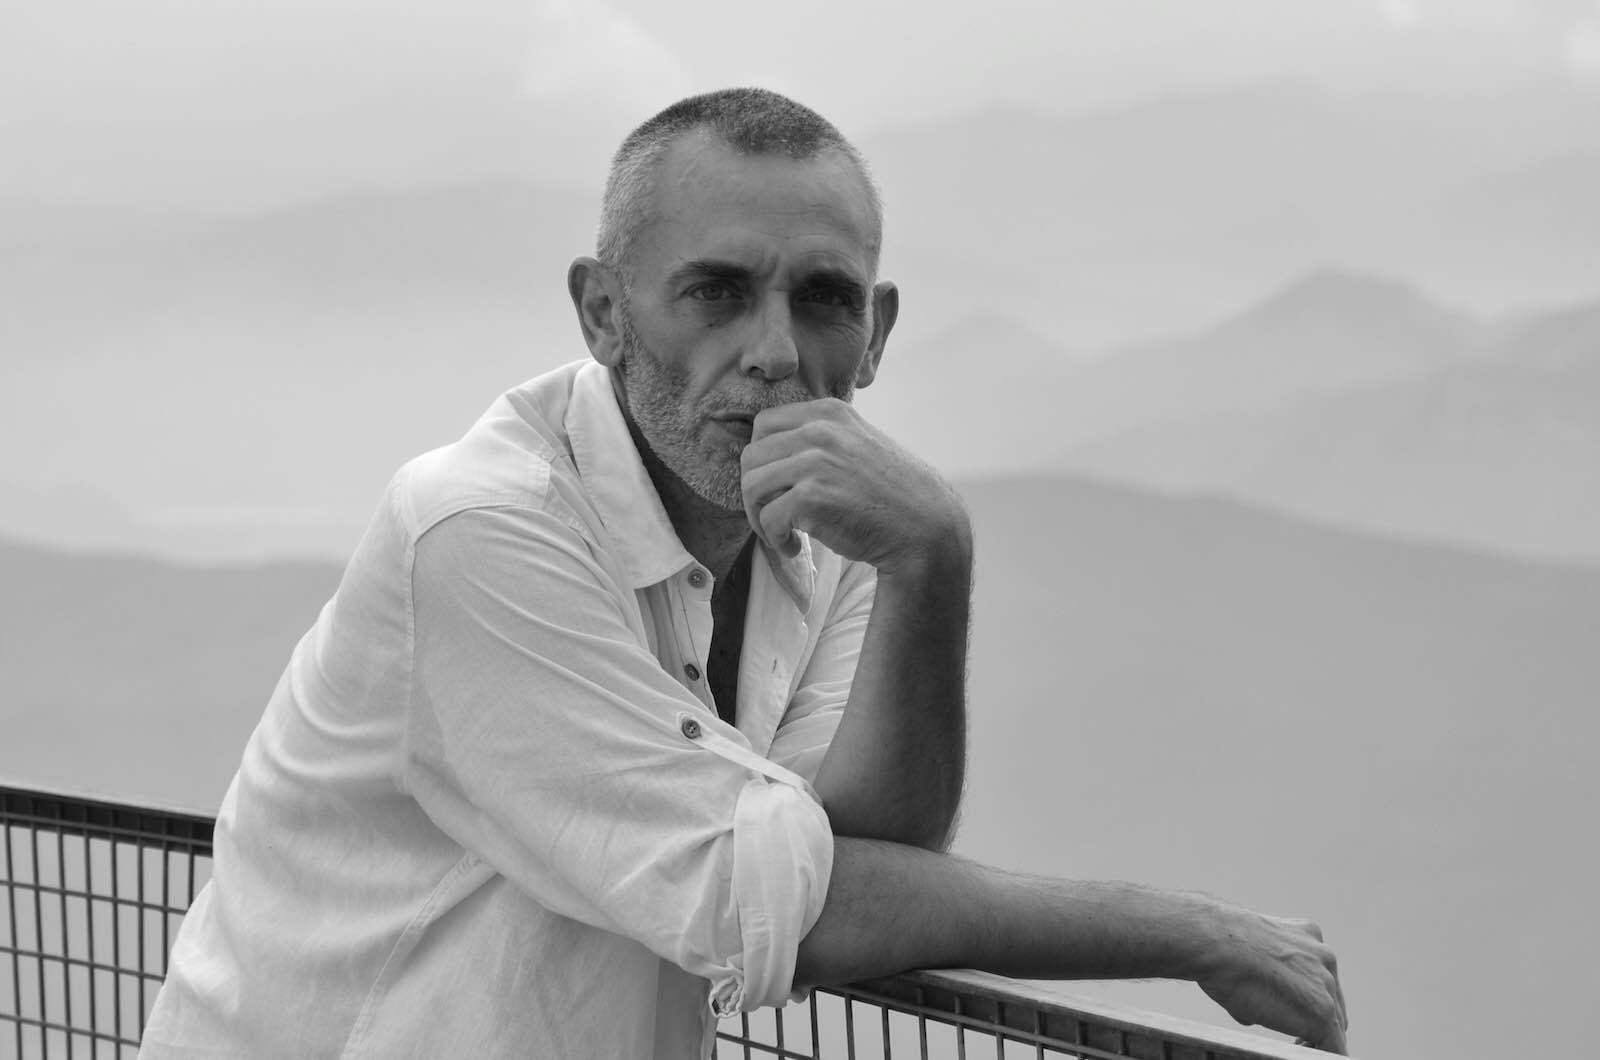 Massimo Botter